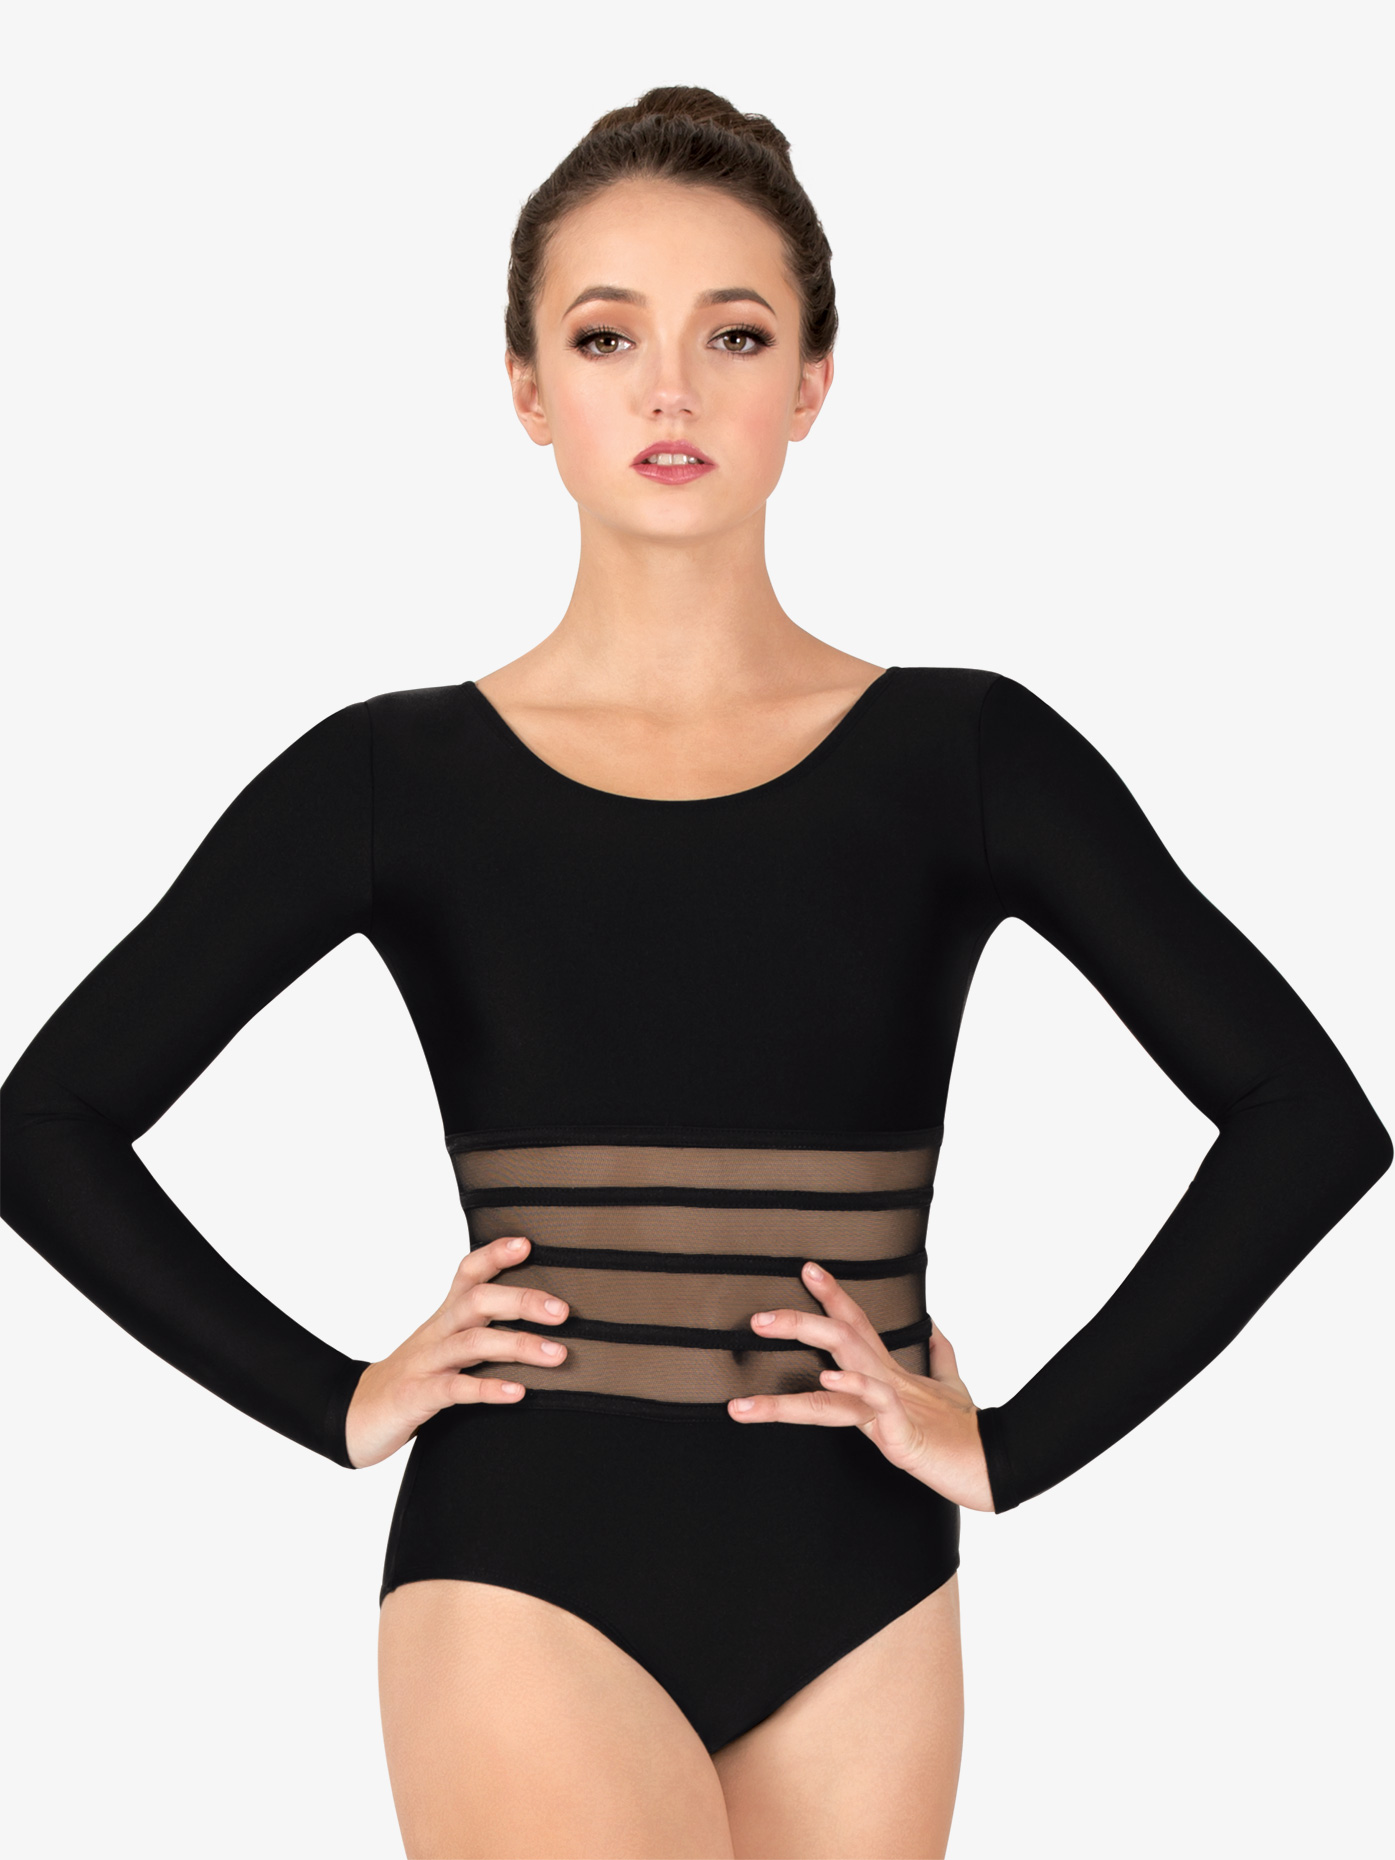 Natalie Couture Womens Mesh Binding Waist Long Sleeve Leotard NC8911